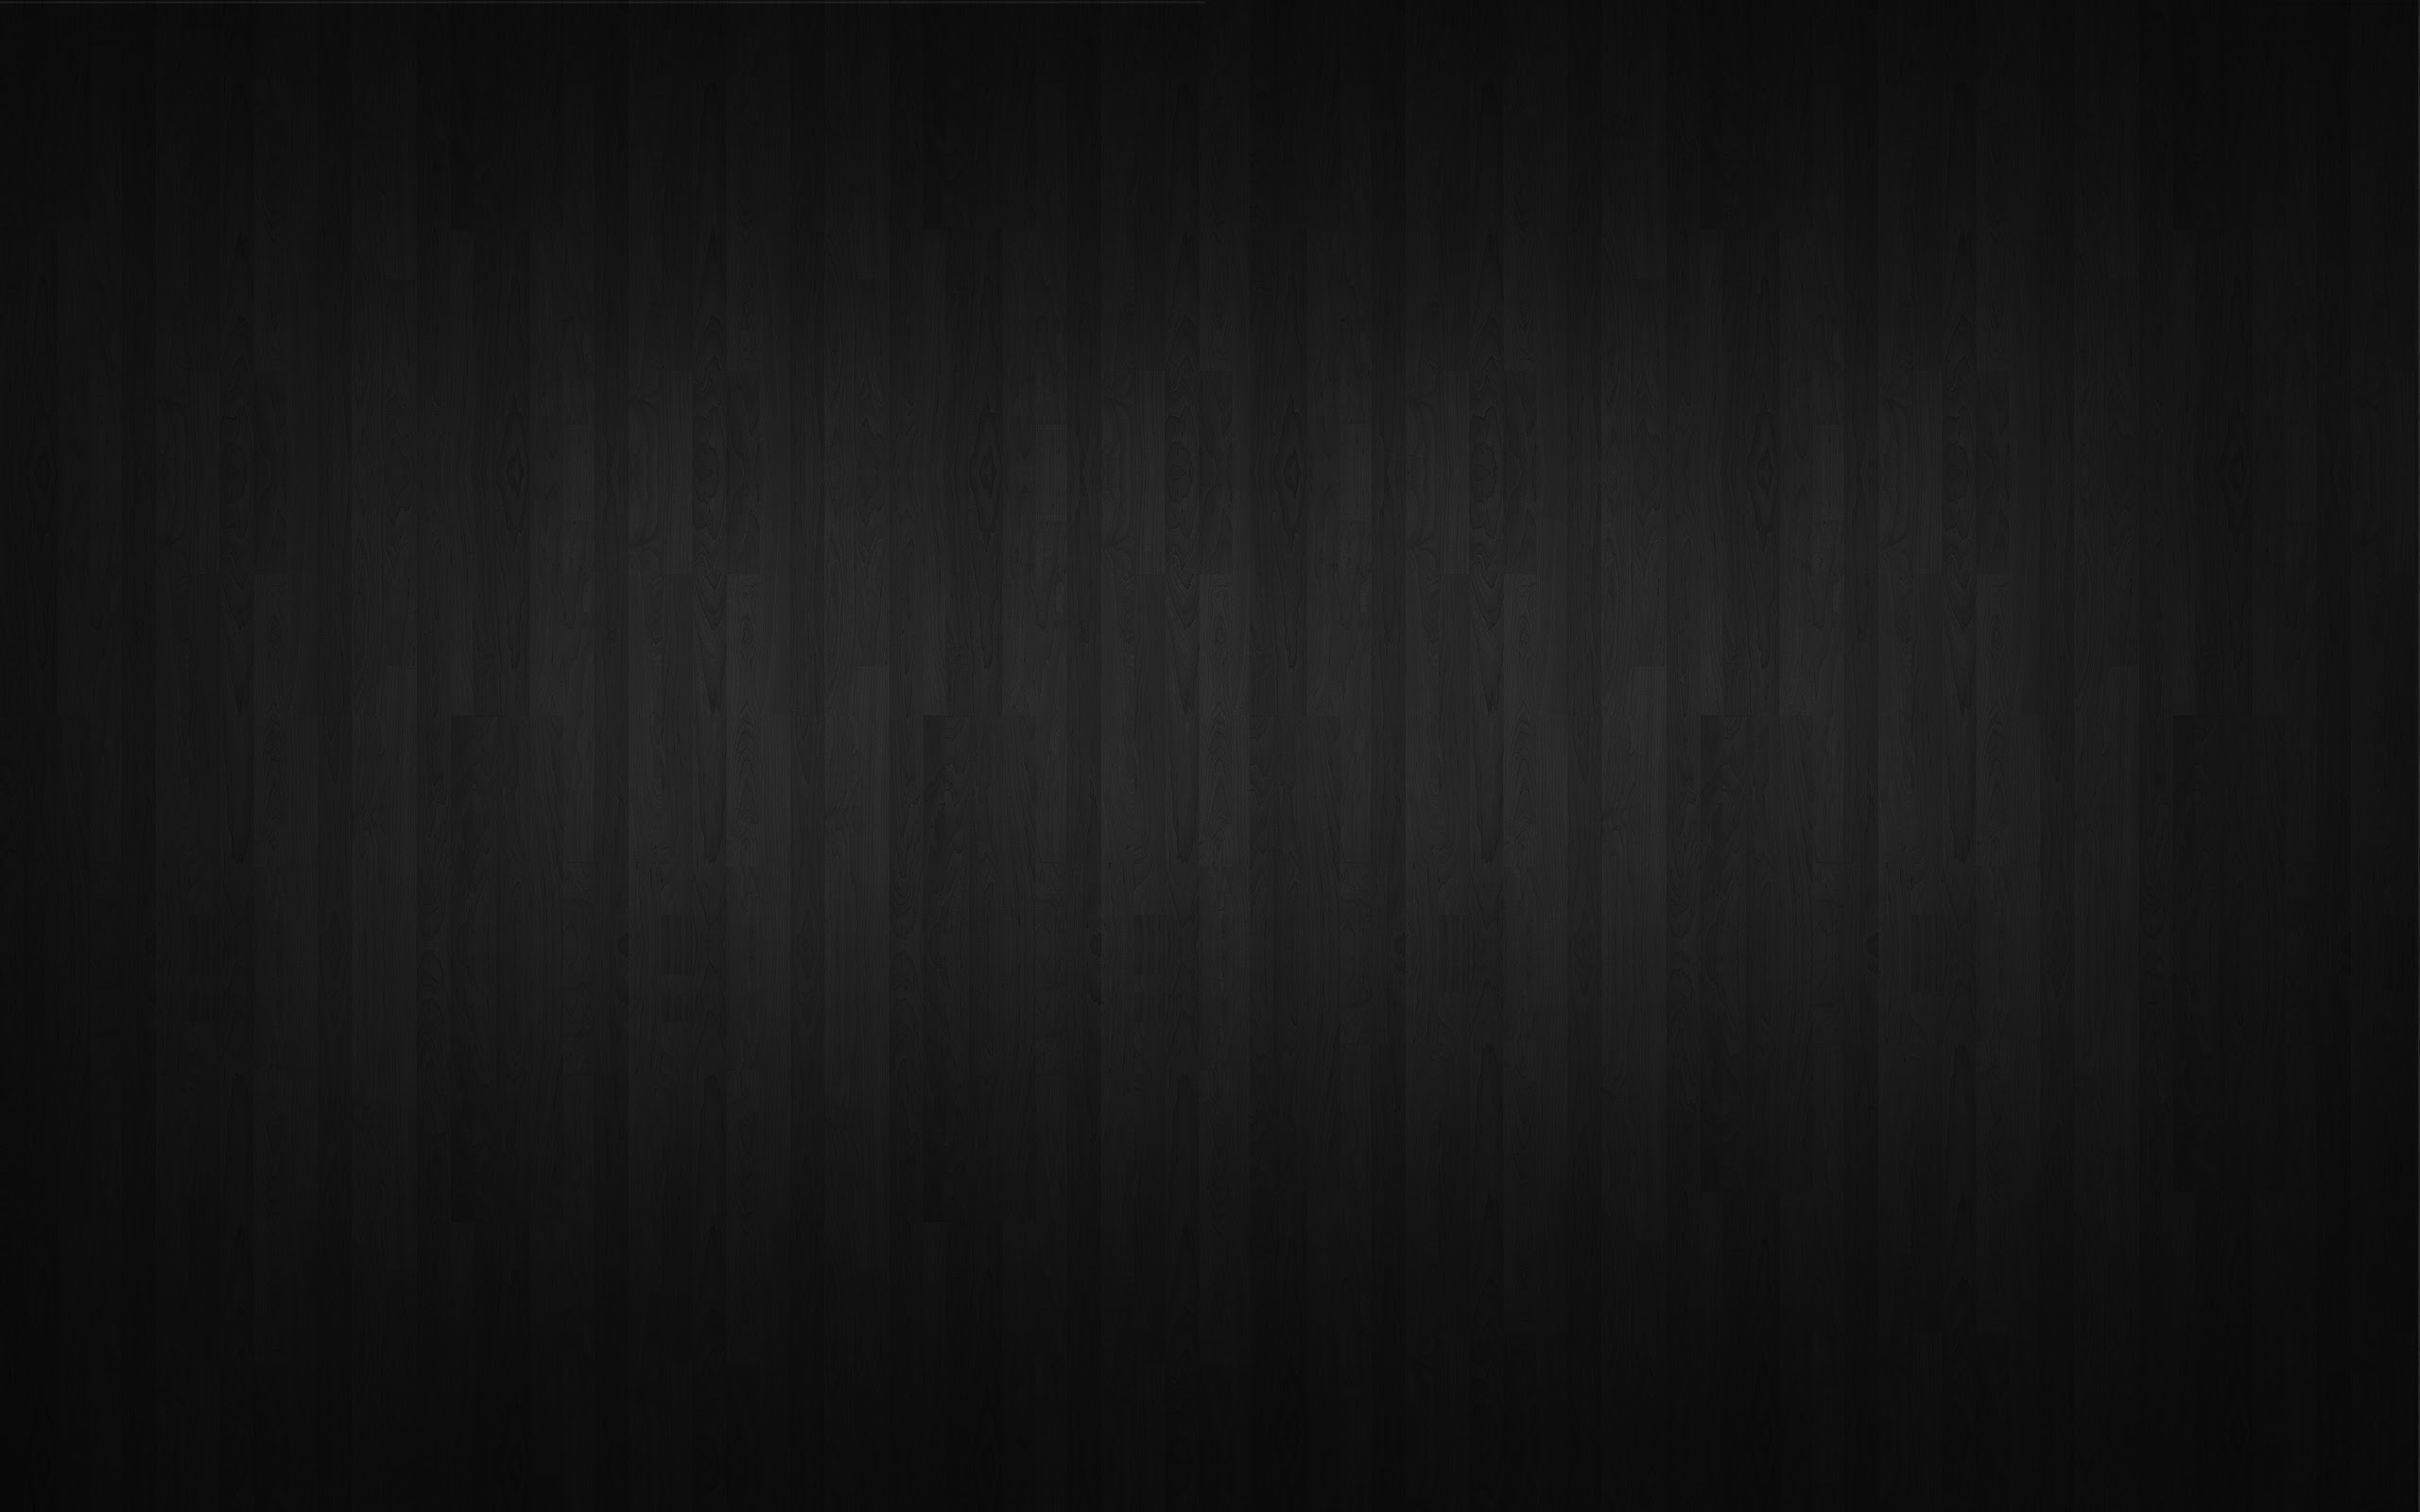 Black Wallpapers  Best Wallpapers